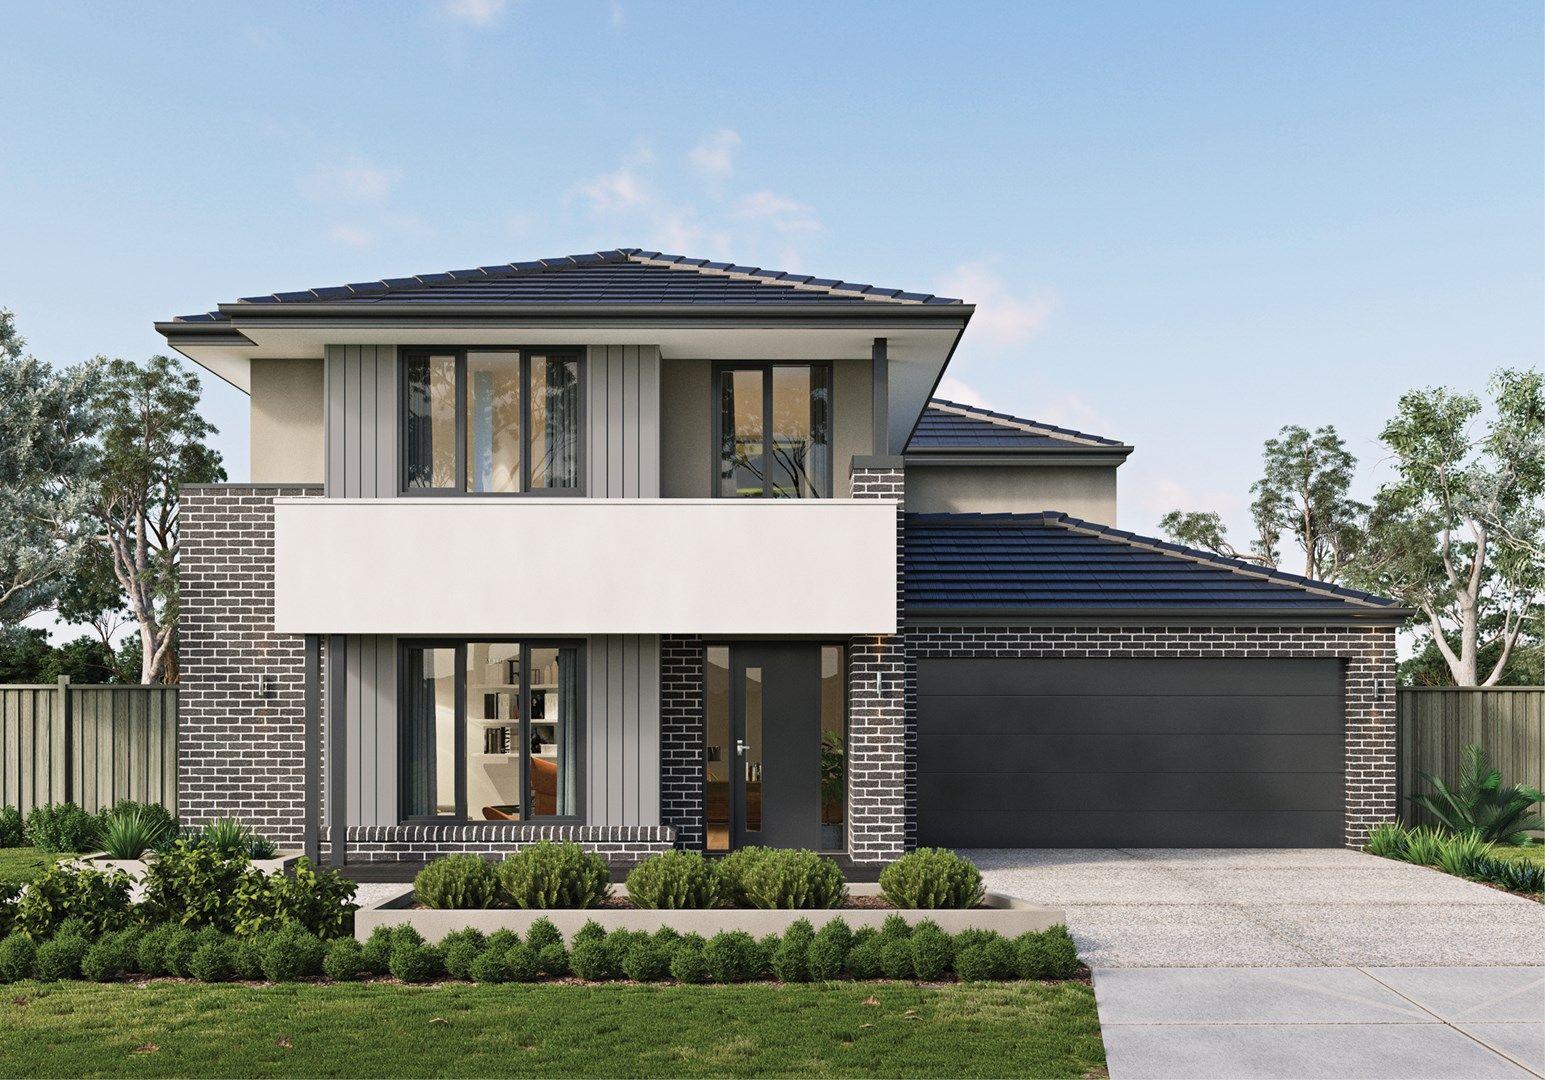 Lot 5424 Abell Road, Elara, Marsden Park NSW 2765, Image 0